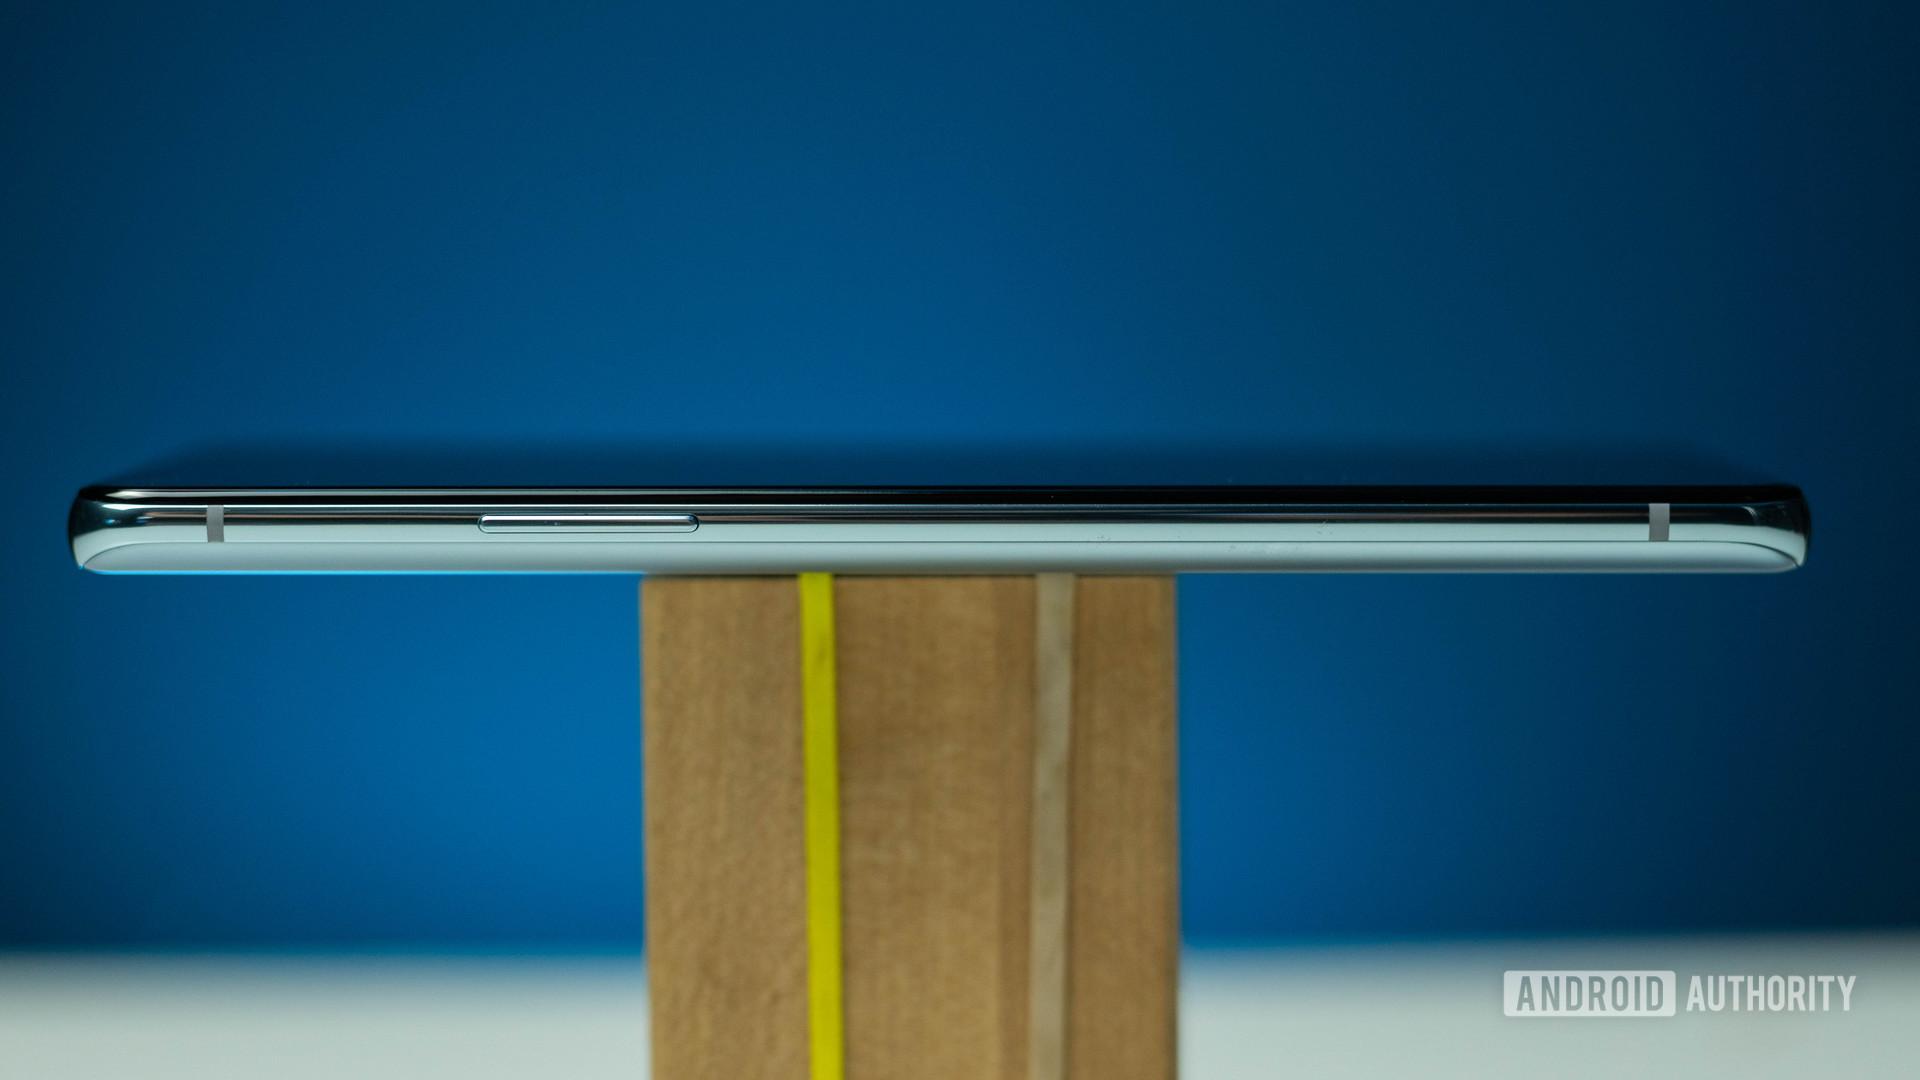 OnePlus 8T left view